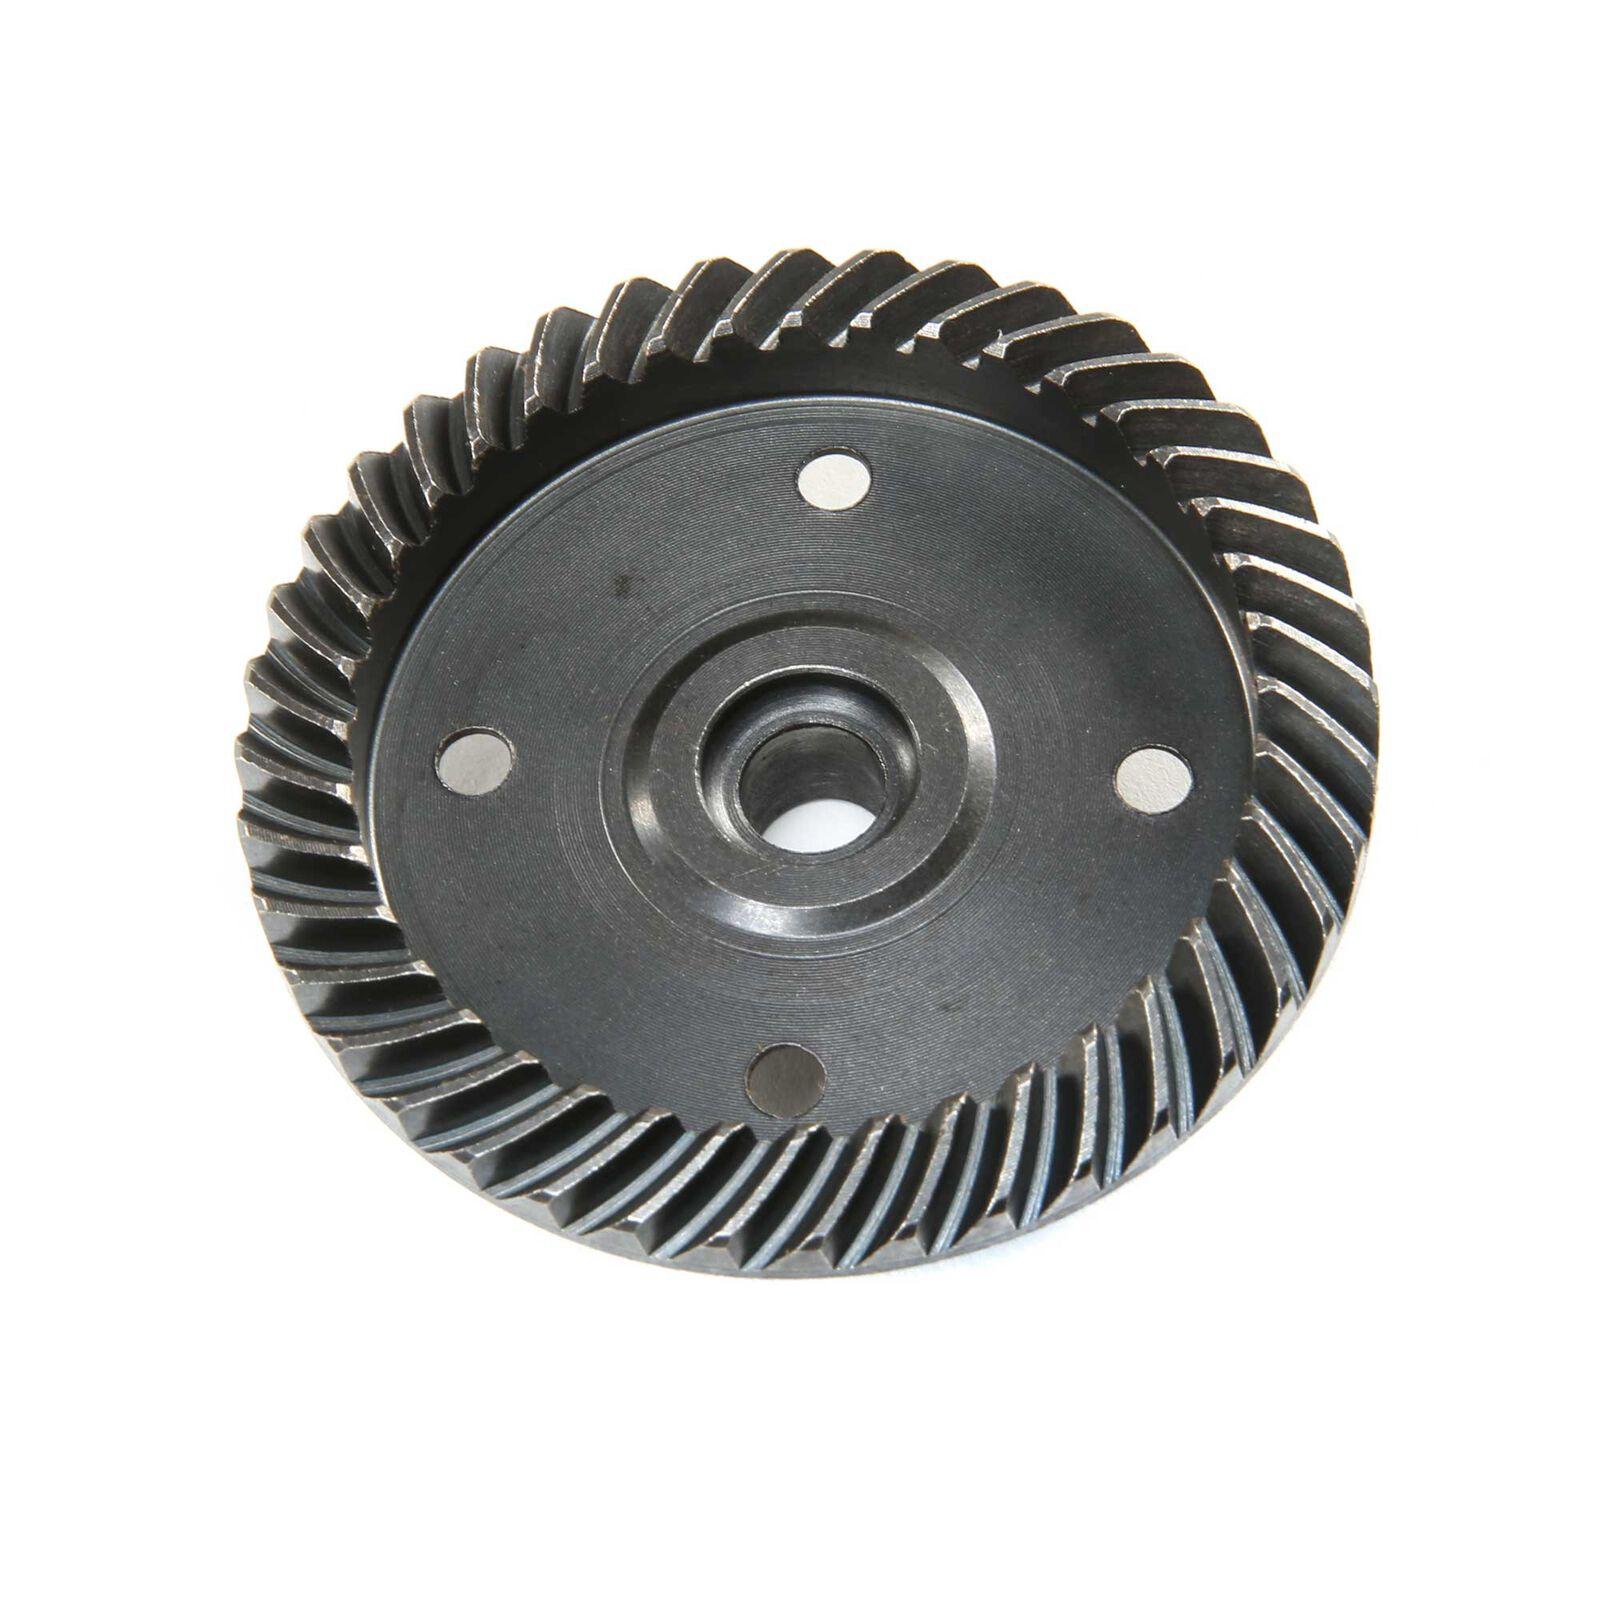 Front Rear Diff Ring Gear, 40T: DBXL-E 2.0